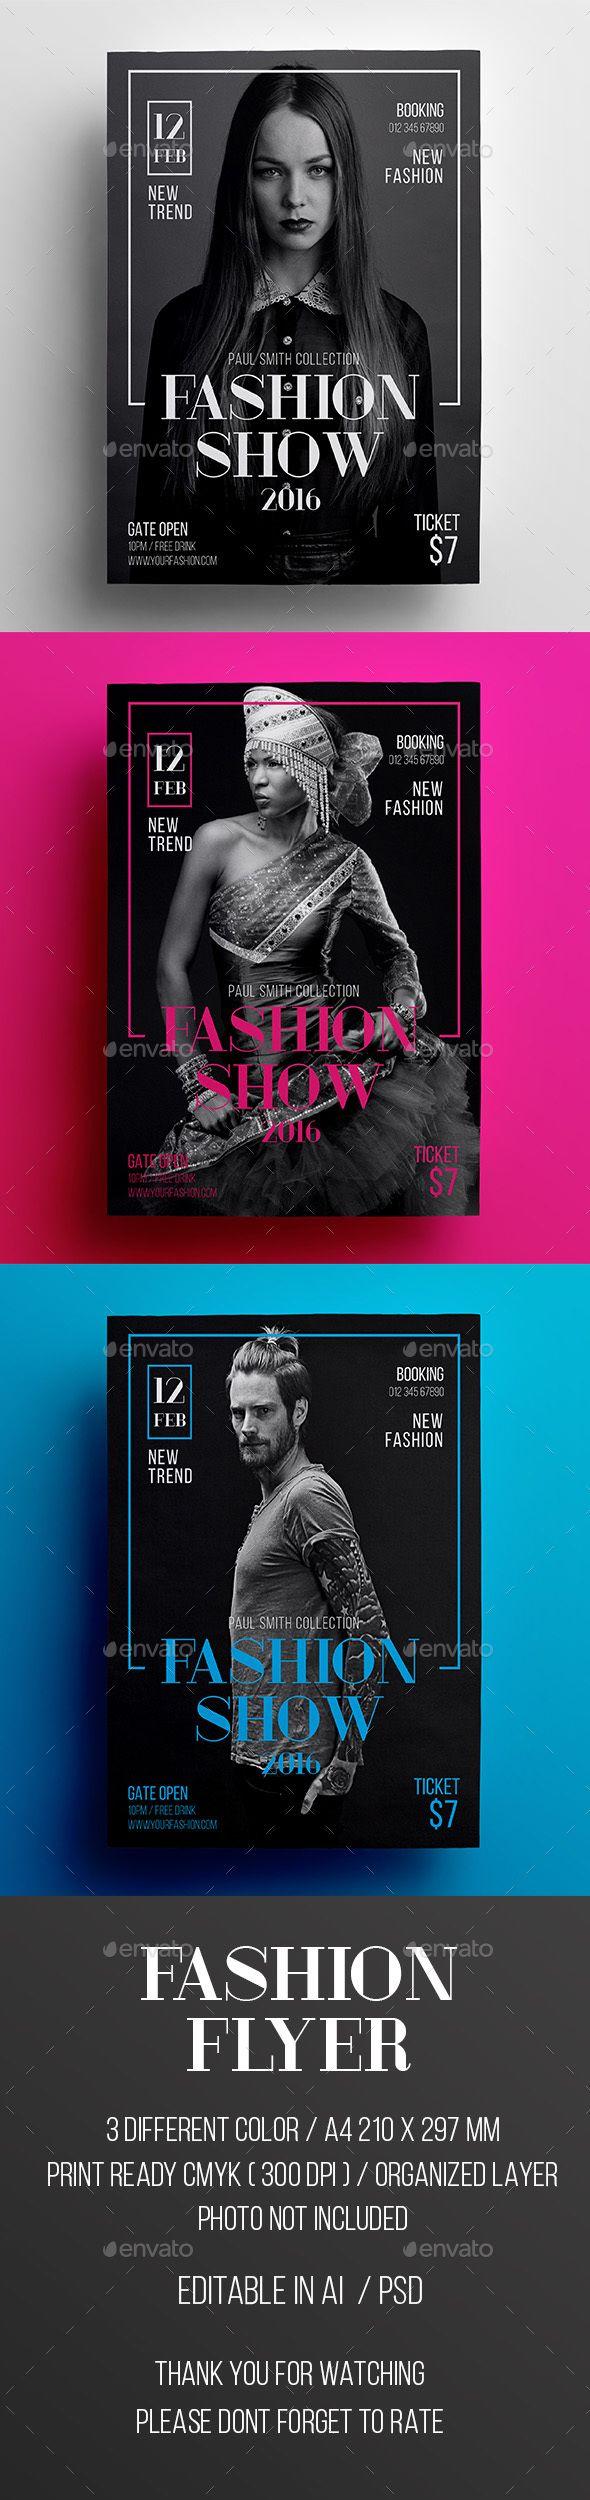 Fashion Show Flyer Flyers Print Templates Referncias